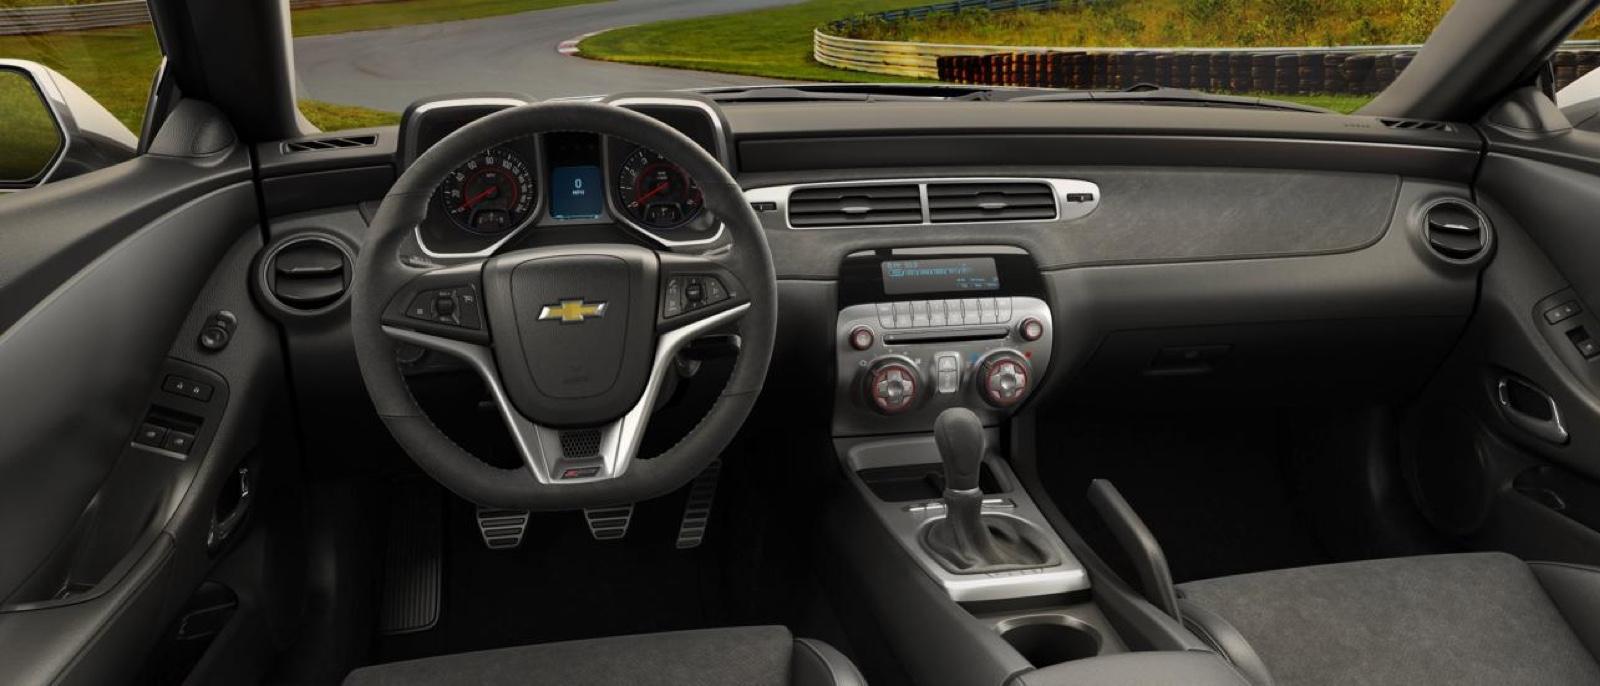 2015 Chevy Camaro Z28 ... Design Inspirations